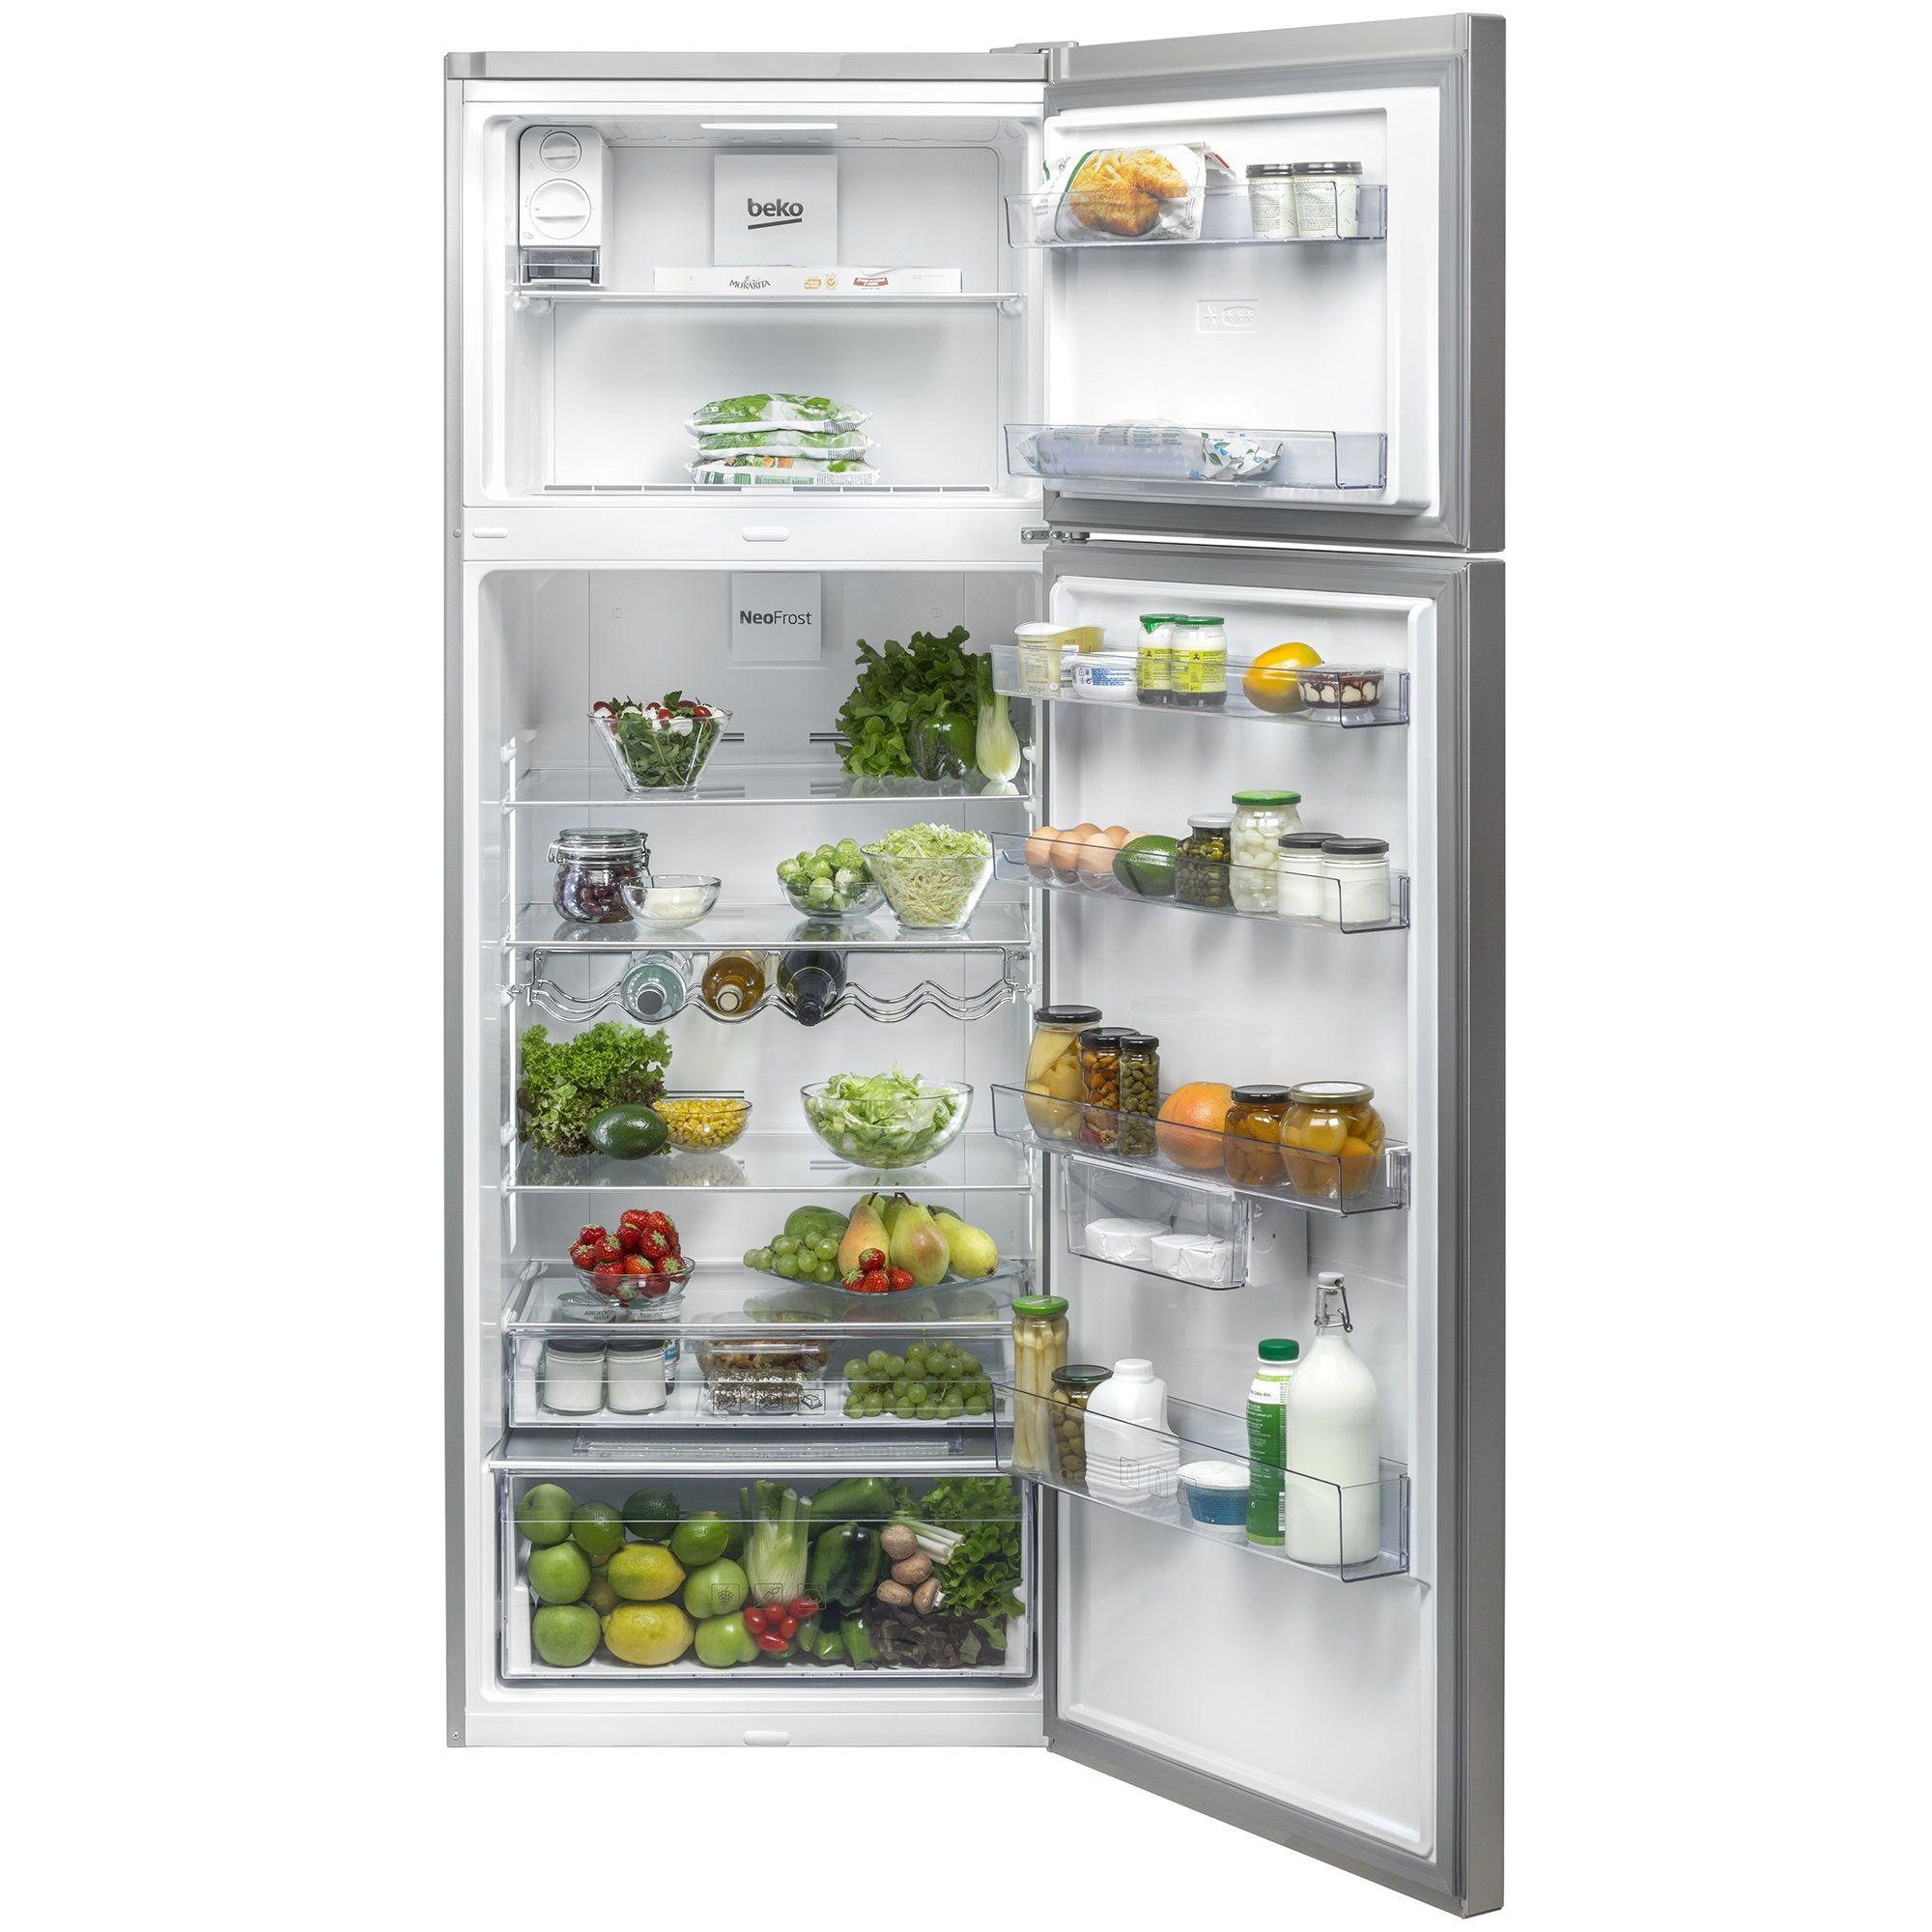 Beko RDNE535E20ZX review, pret, pareri, opinii, frigider, compartimentare